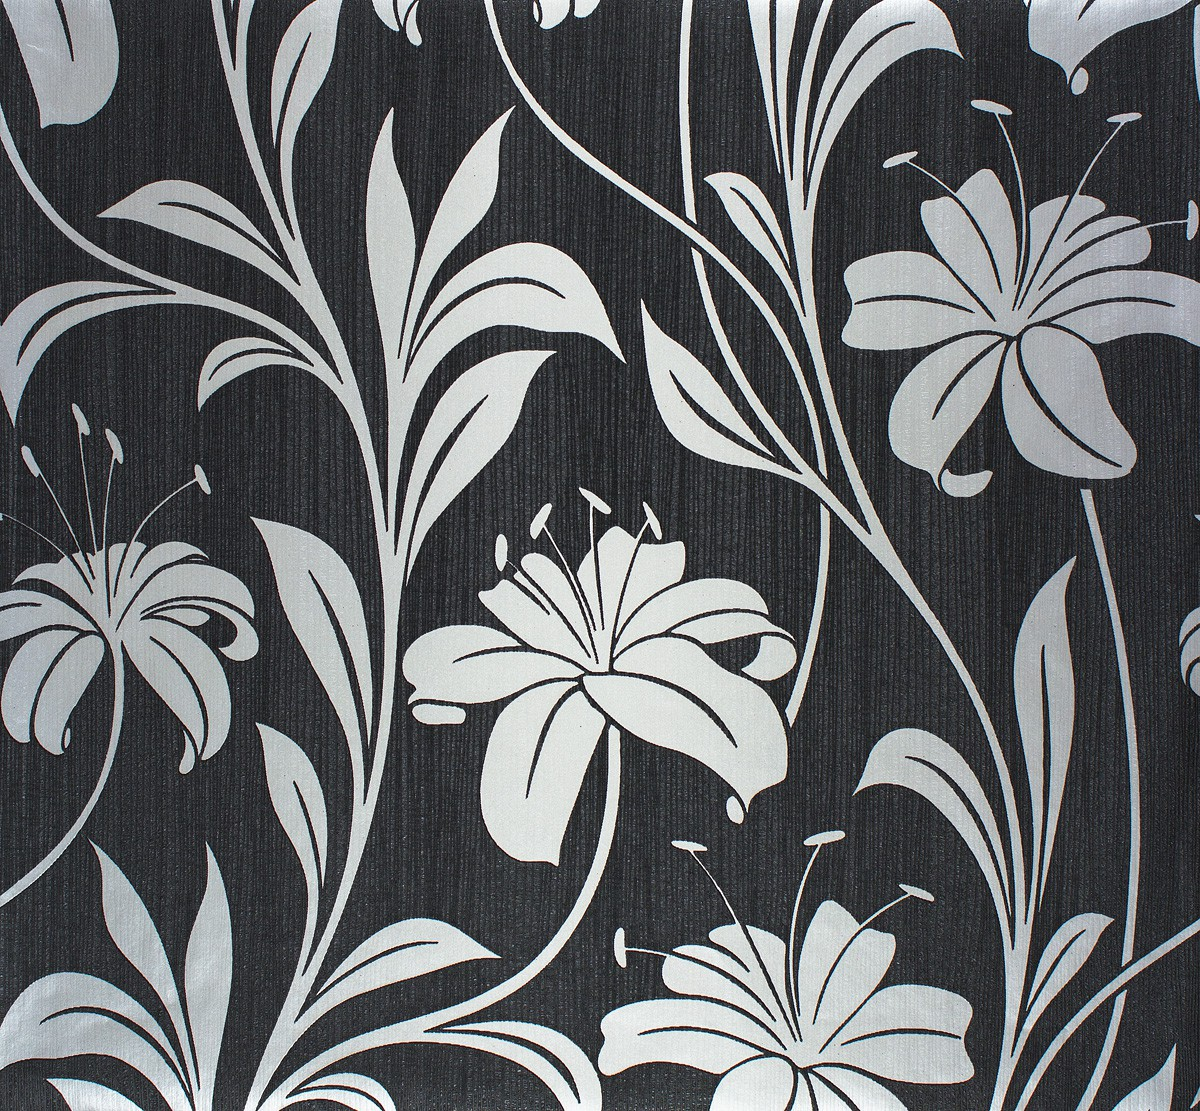 vliestapete floral schwarz silber marburg 55121. Black Bedroom Furniture Sets. Home Design Ideas